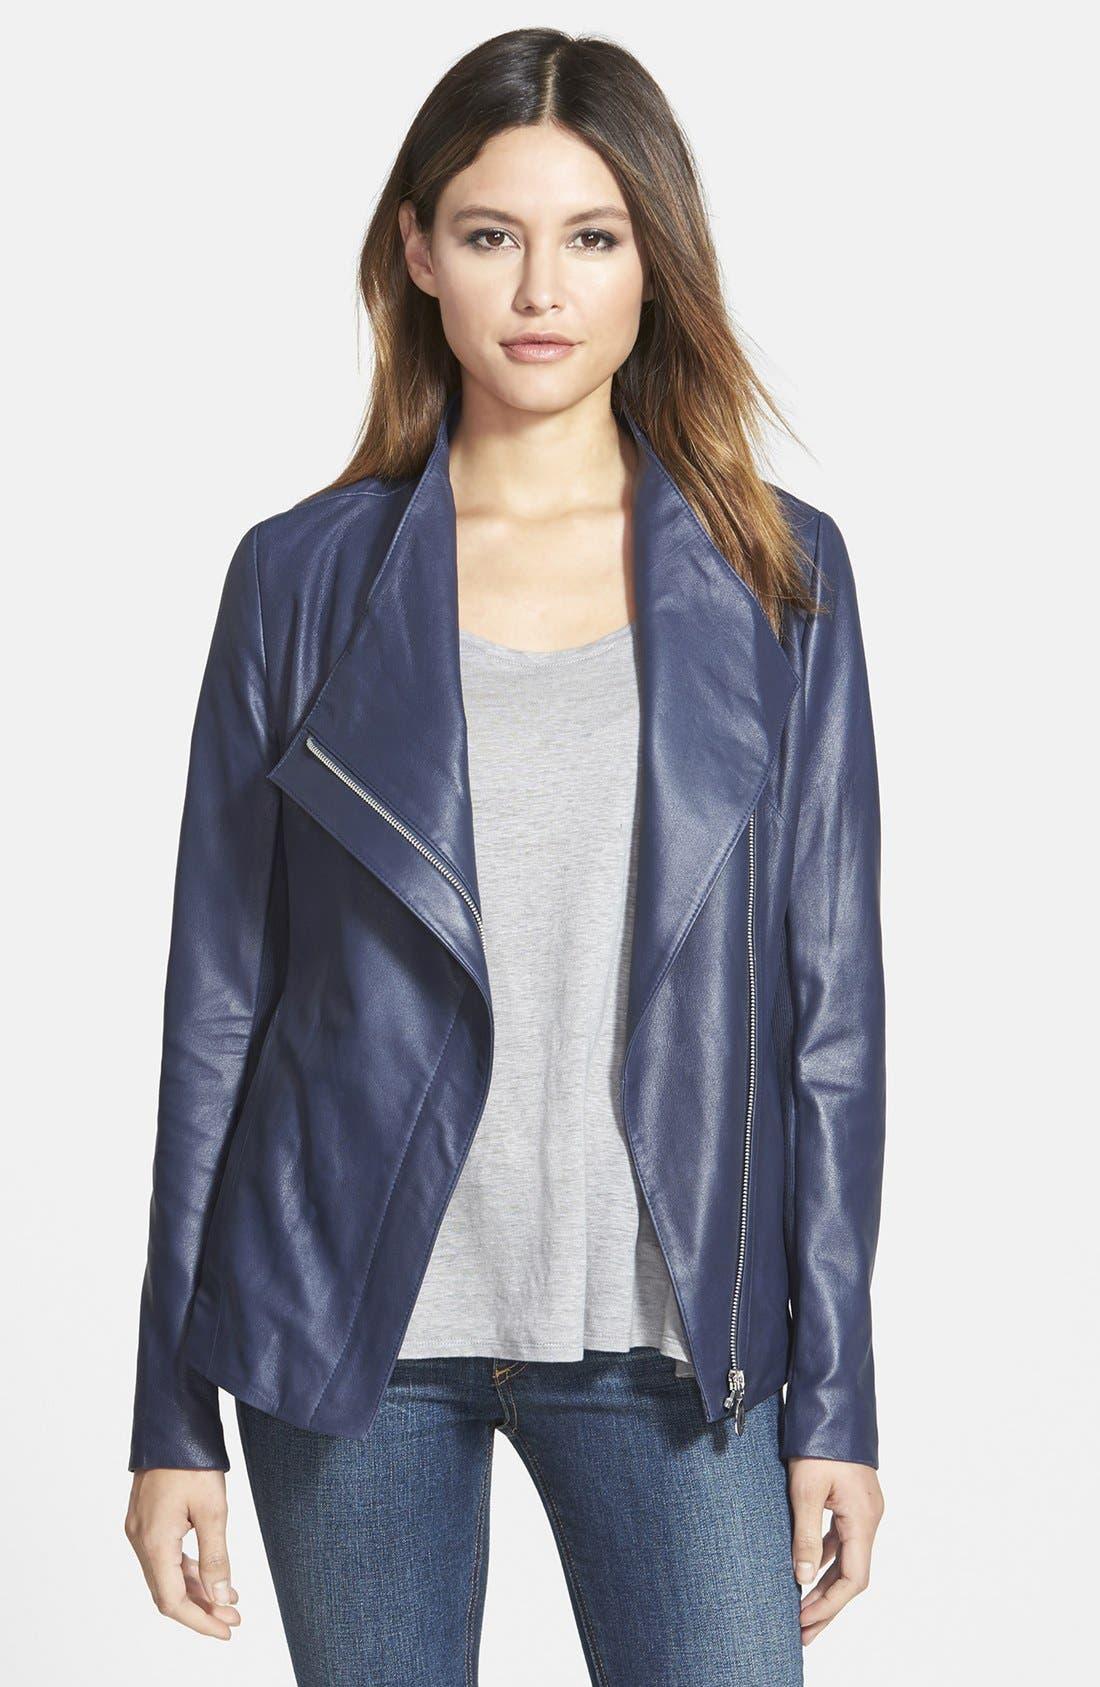 Alternate Image 1 Selected - Elie Tahari 'Constance' Drape Front Leather Jacket